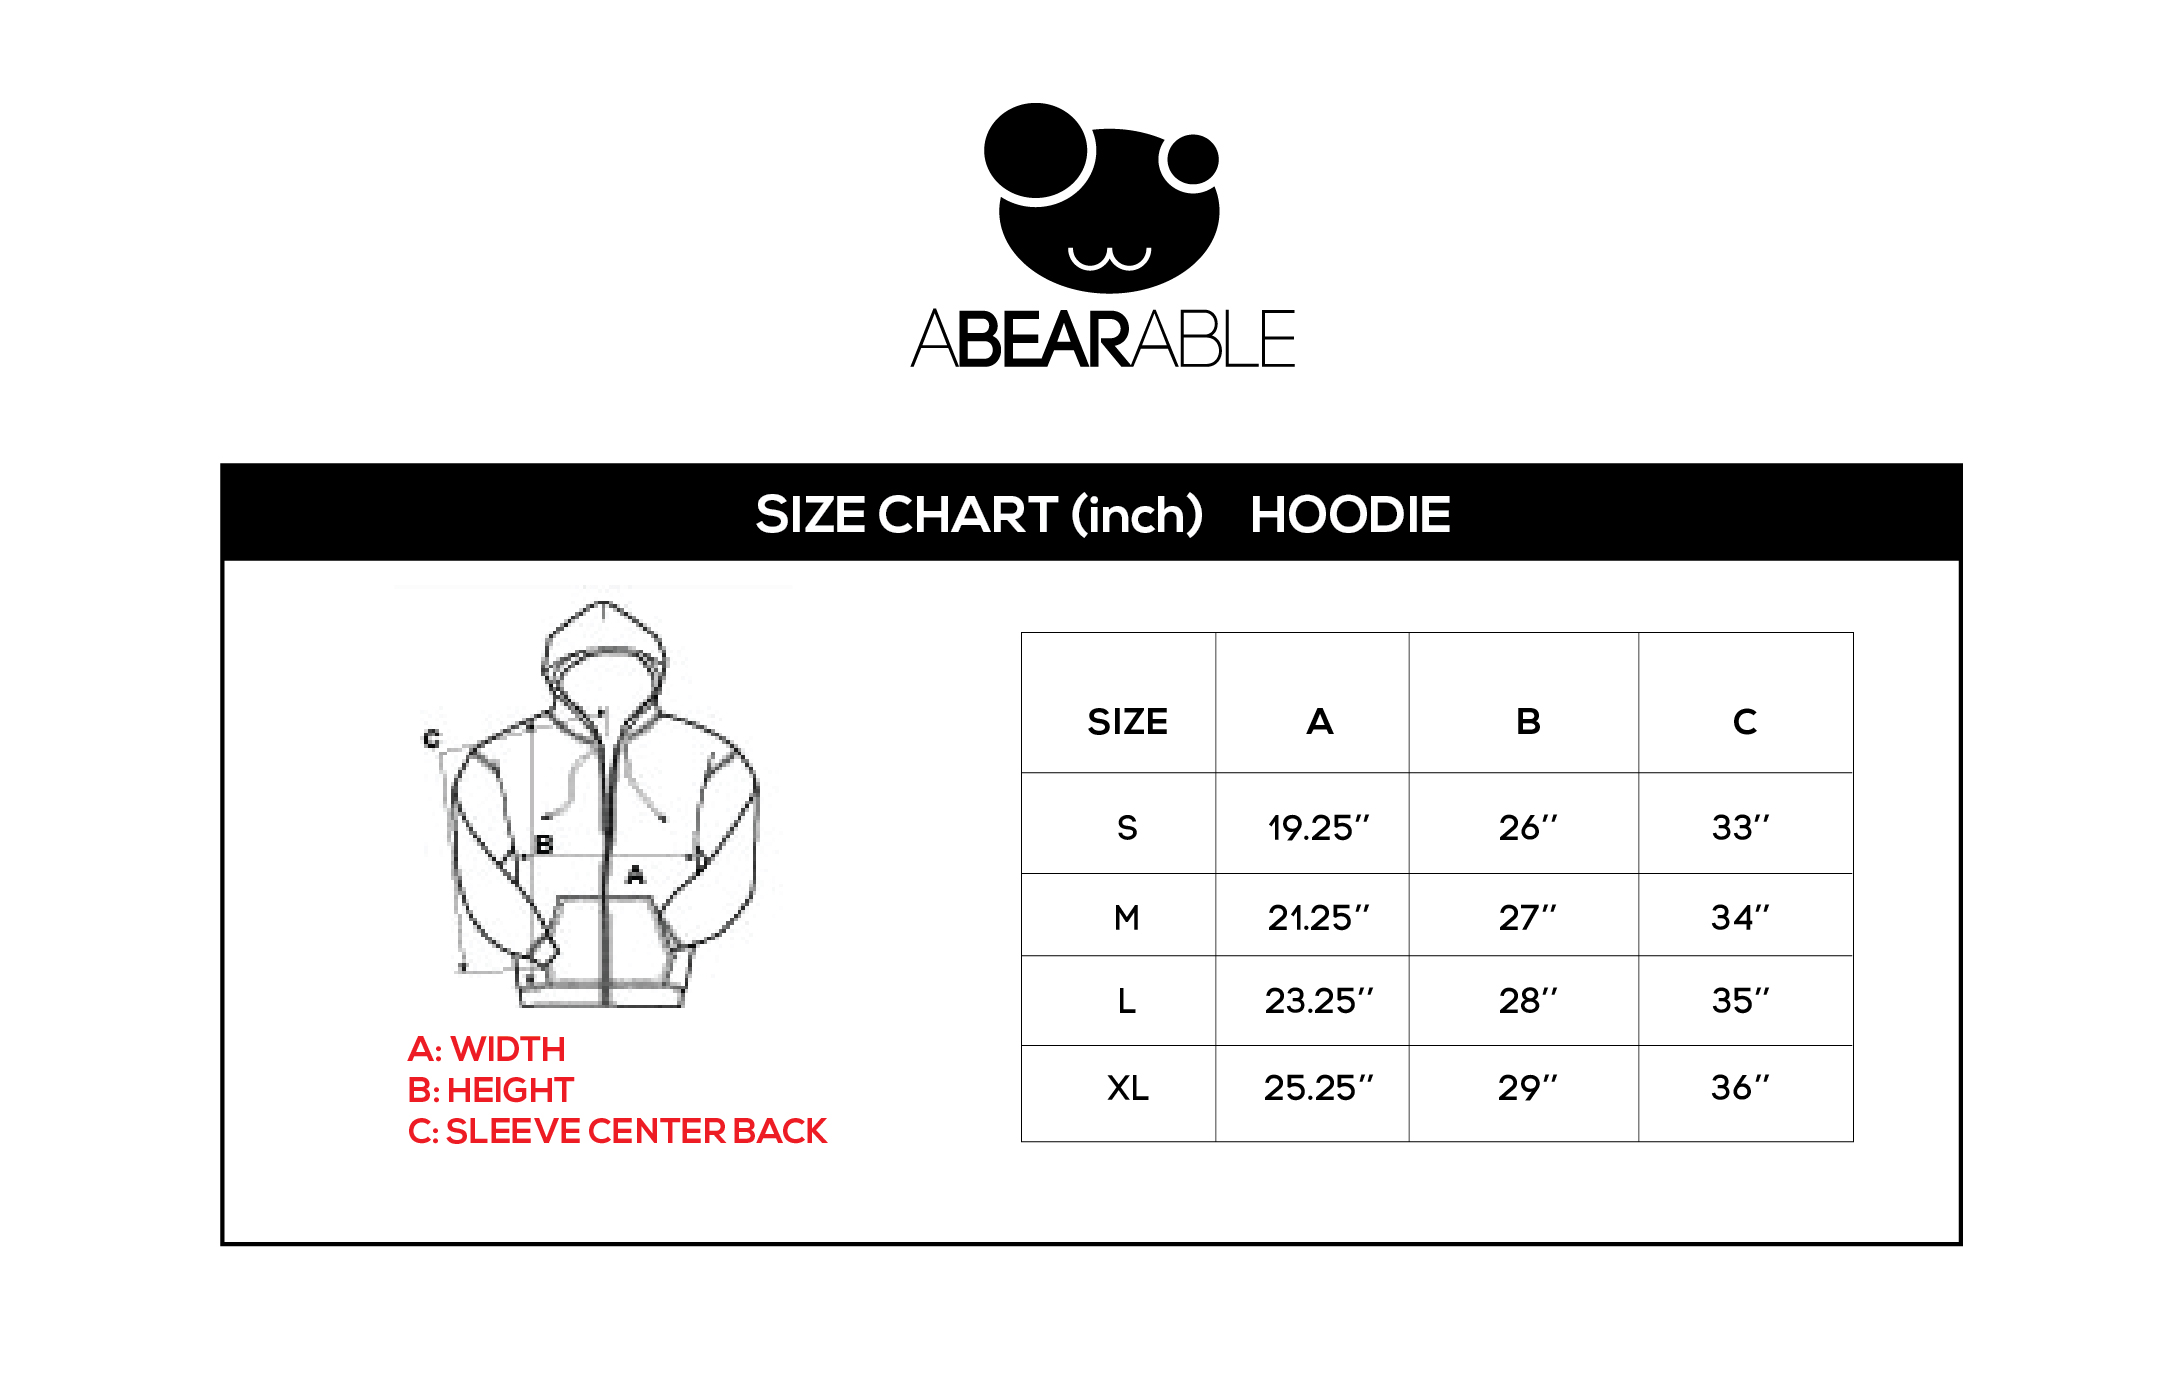 abearable,bear,bearlover,cute,minimal,jacket,winter,เสื้อคลุม,เสื้อกันหนาว,design,products,giftideas,spiritedaway,noface,kaonashi